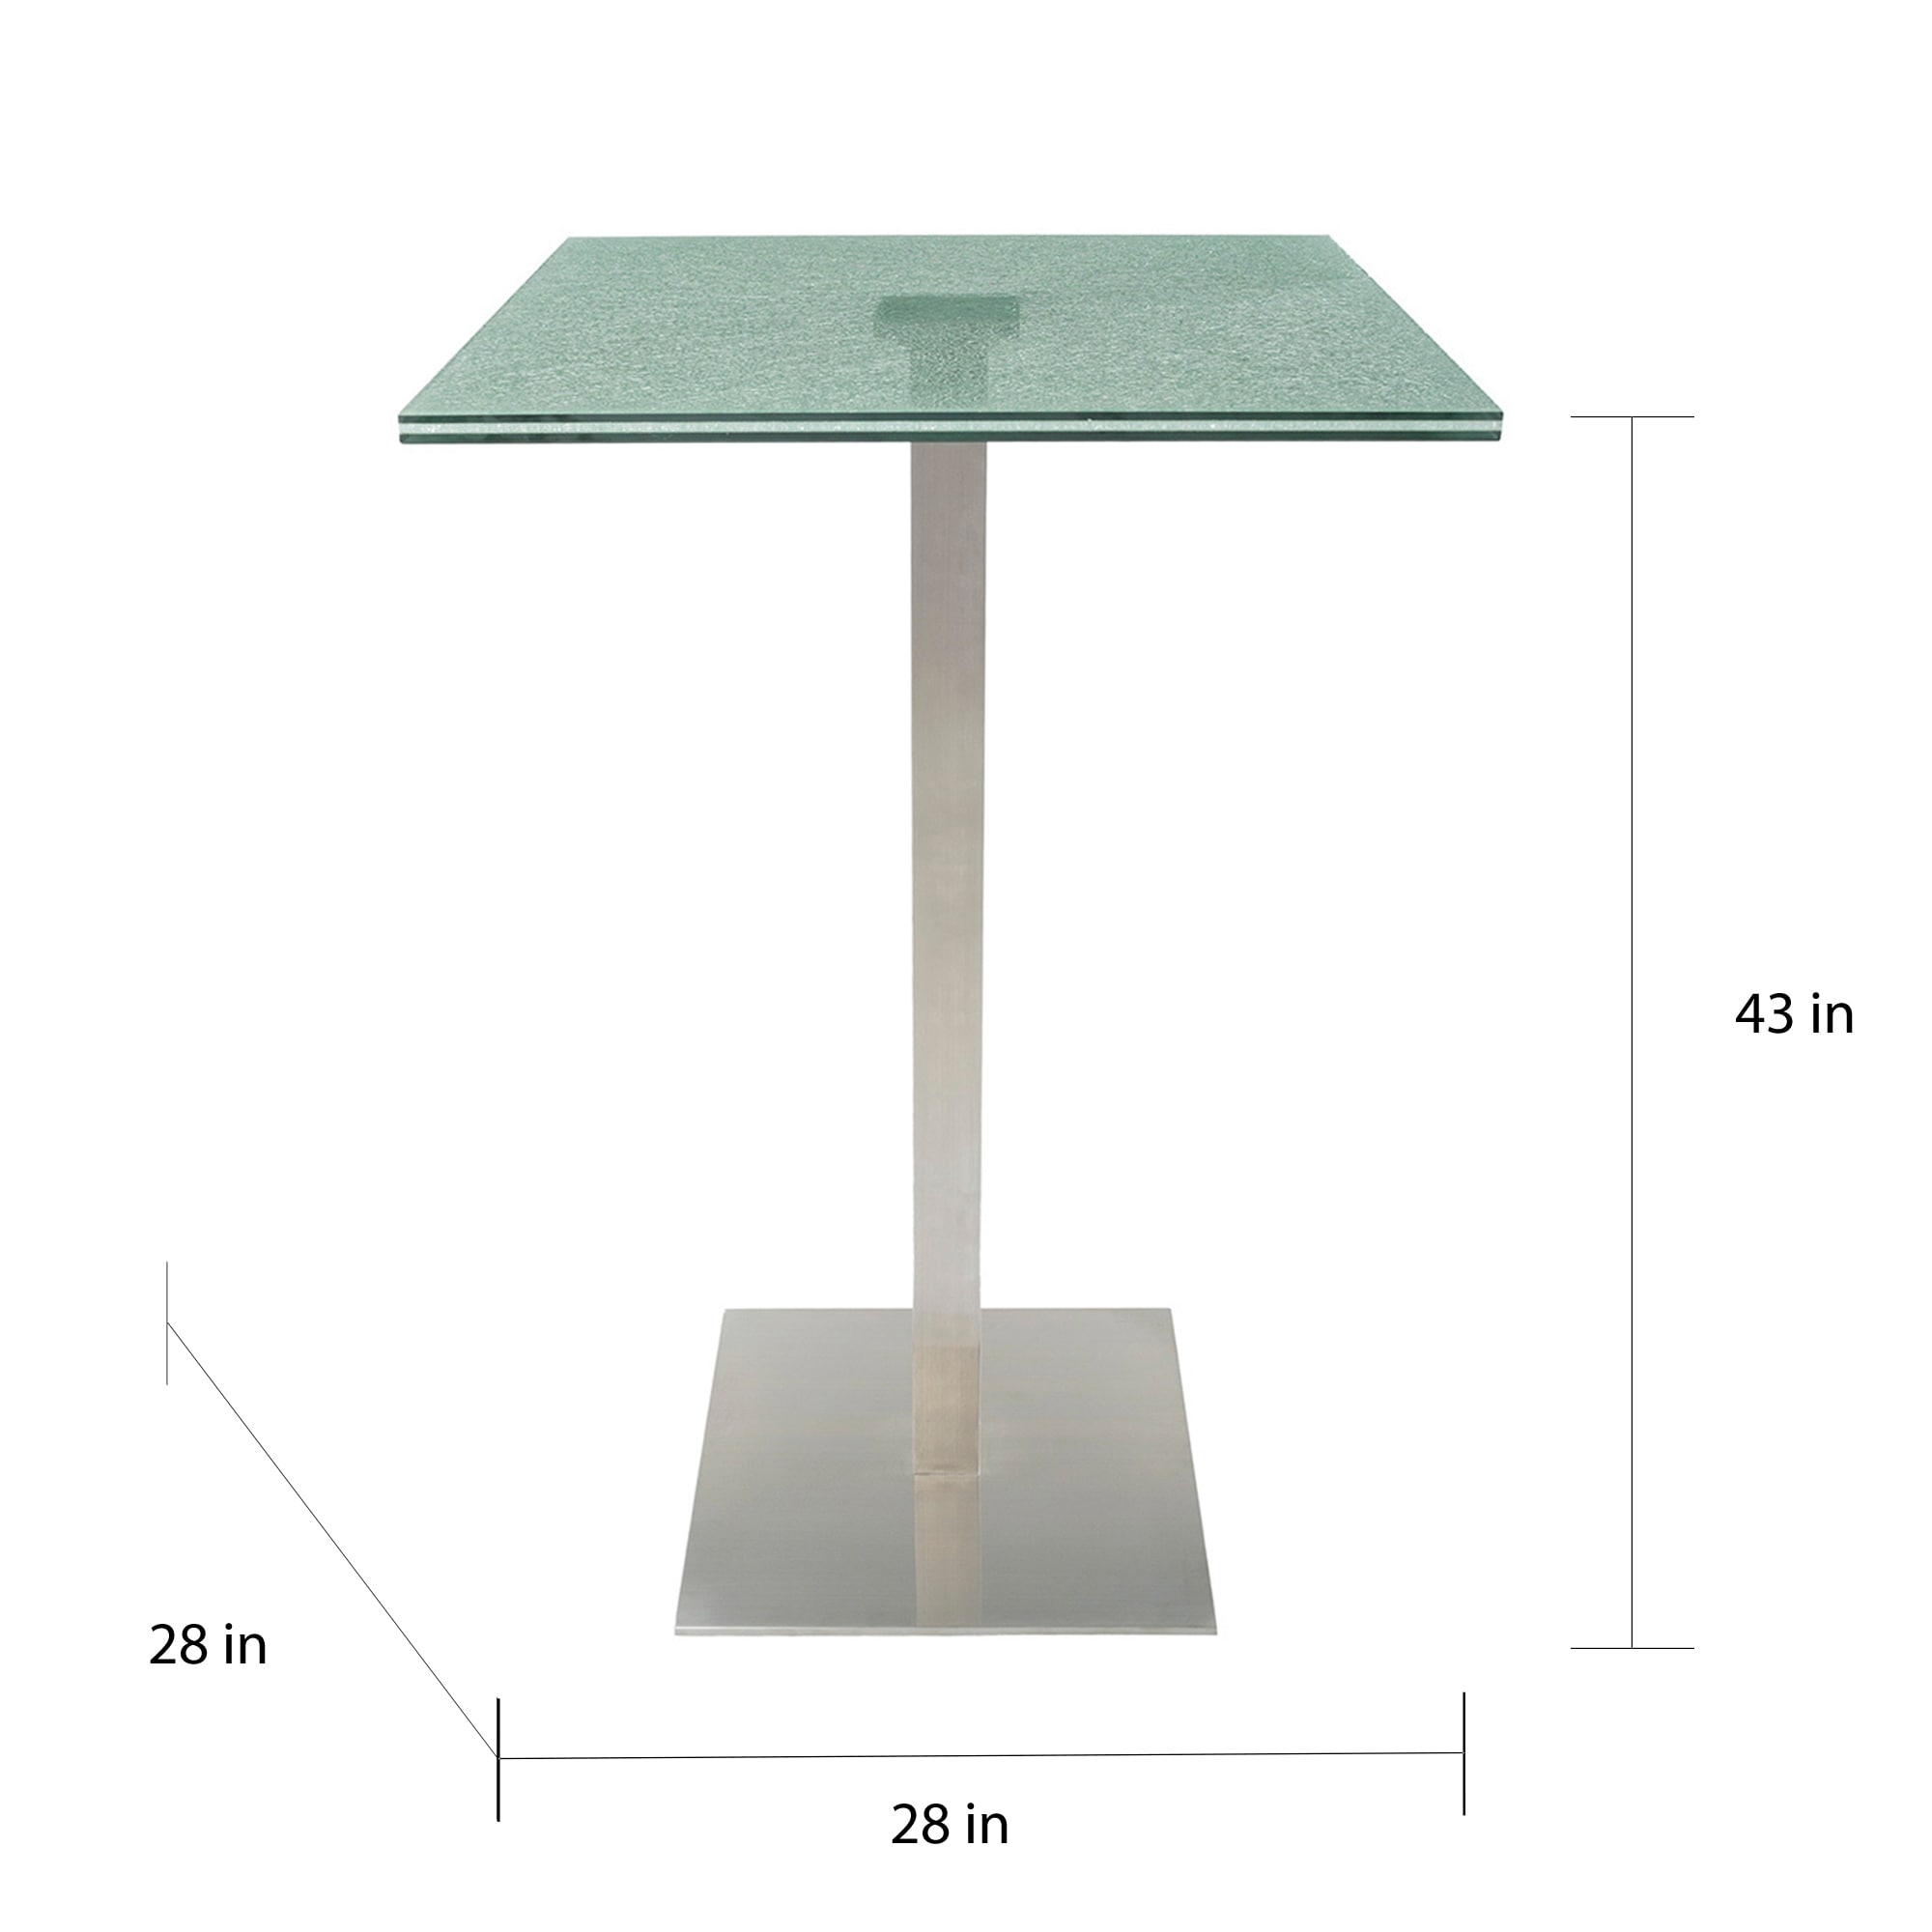 Shop Oliver James Faini Brushed Stainless Steel Pub Table On - Square pedestal pub table